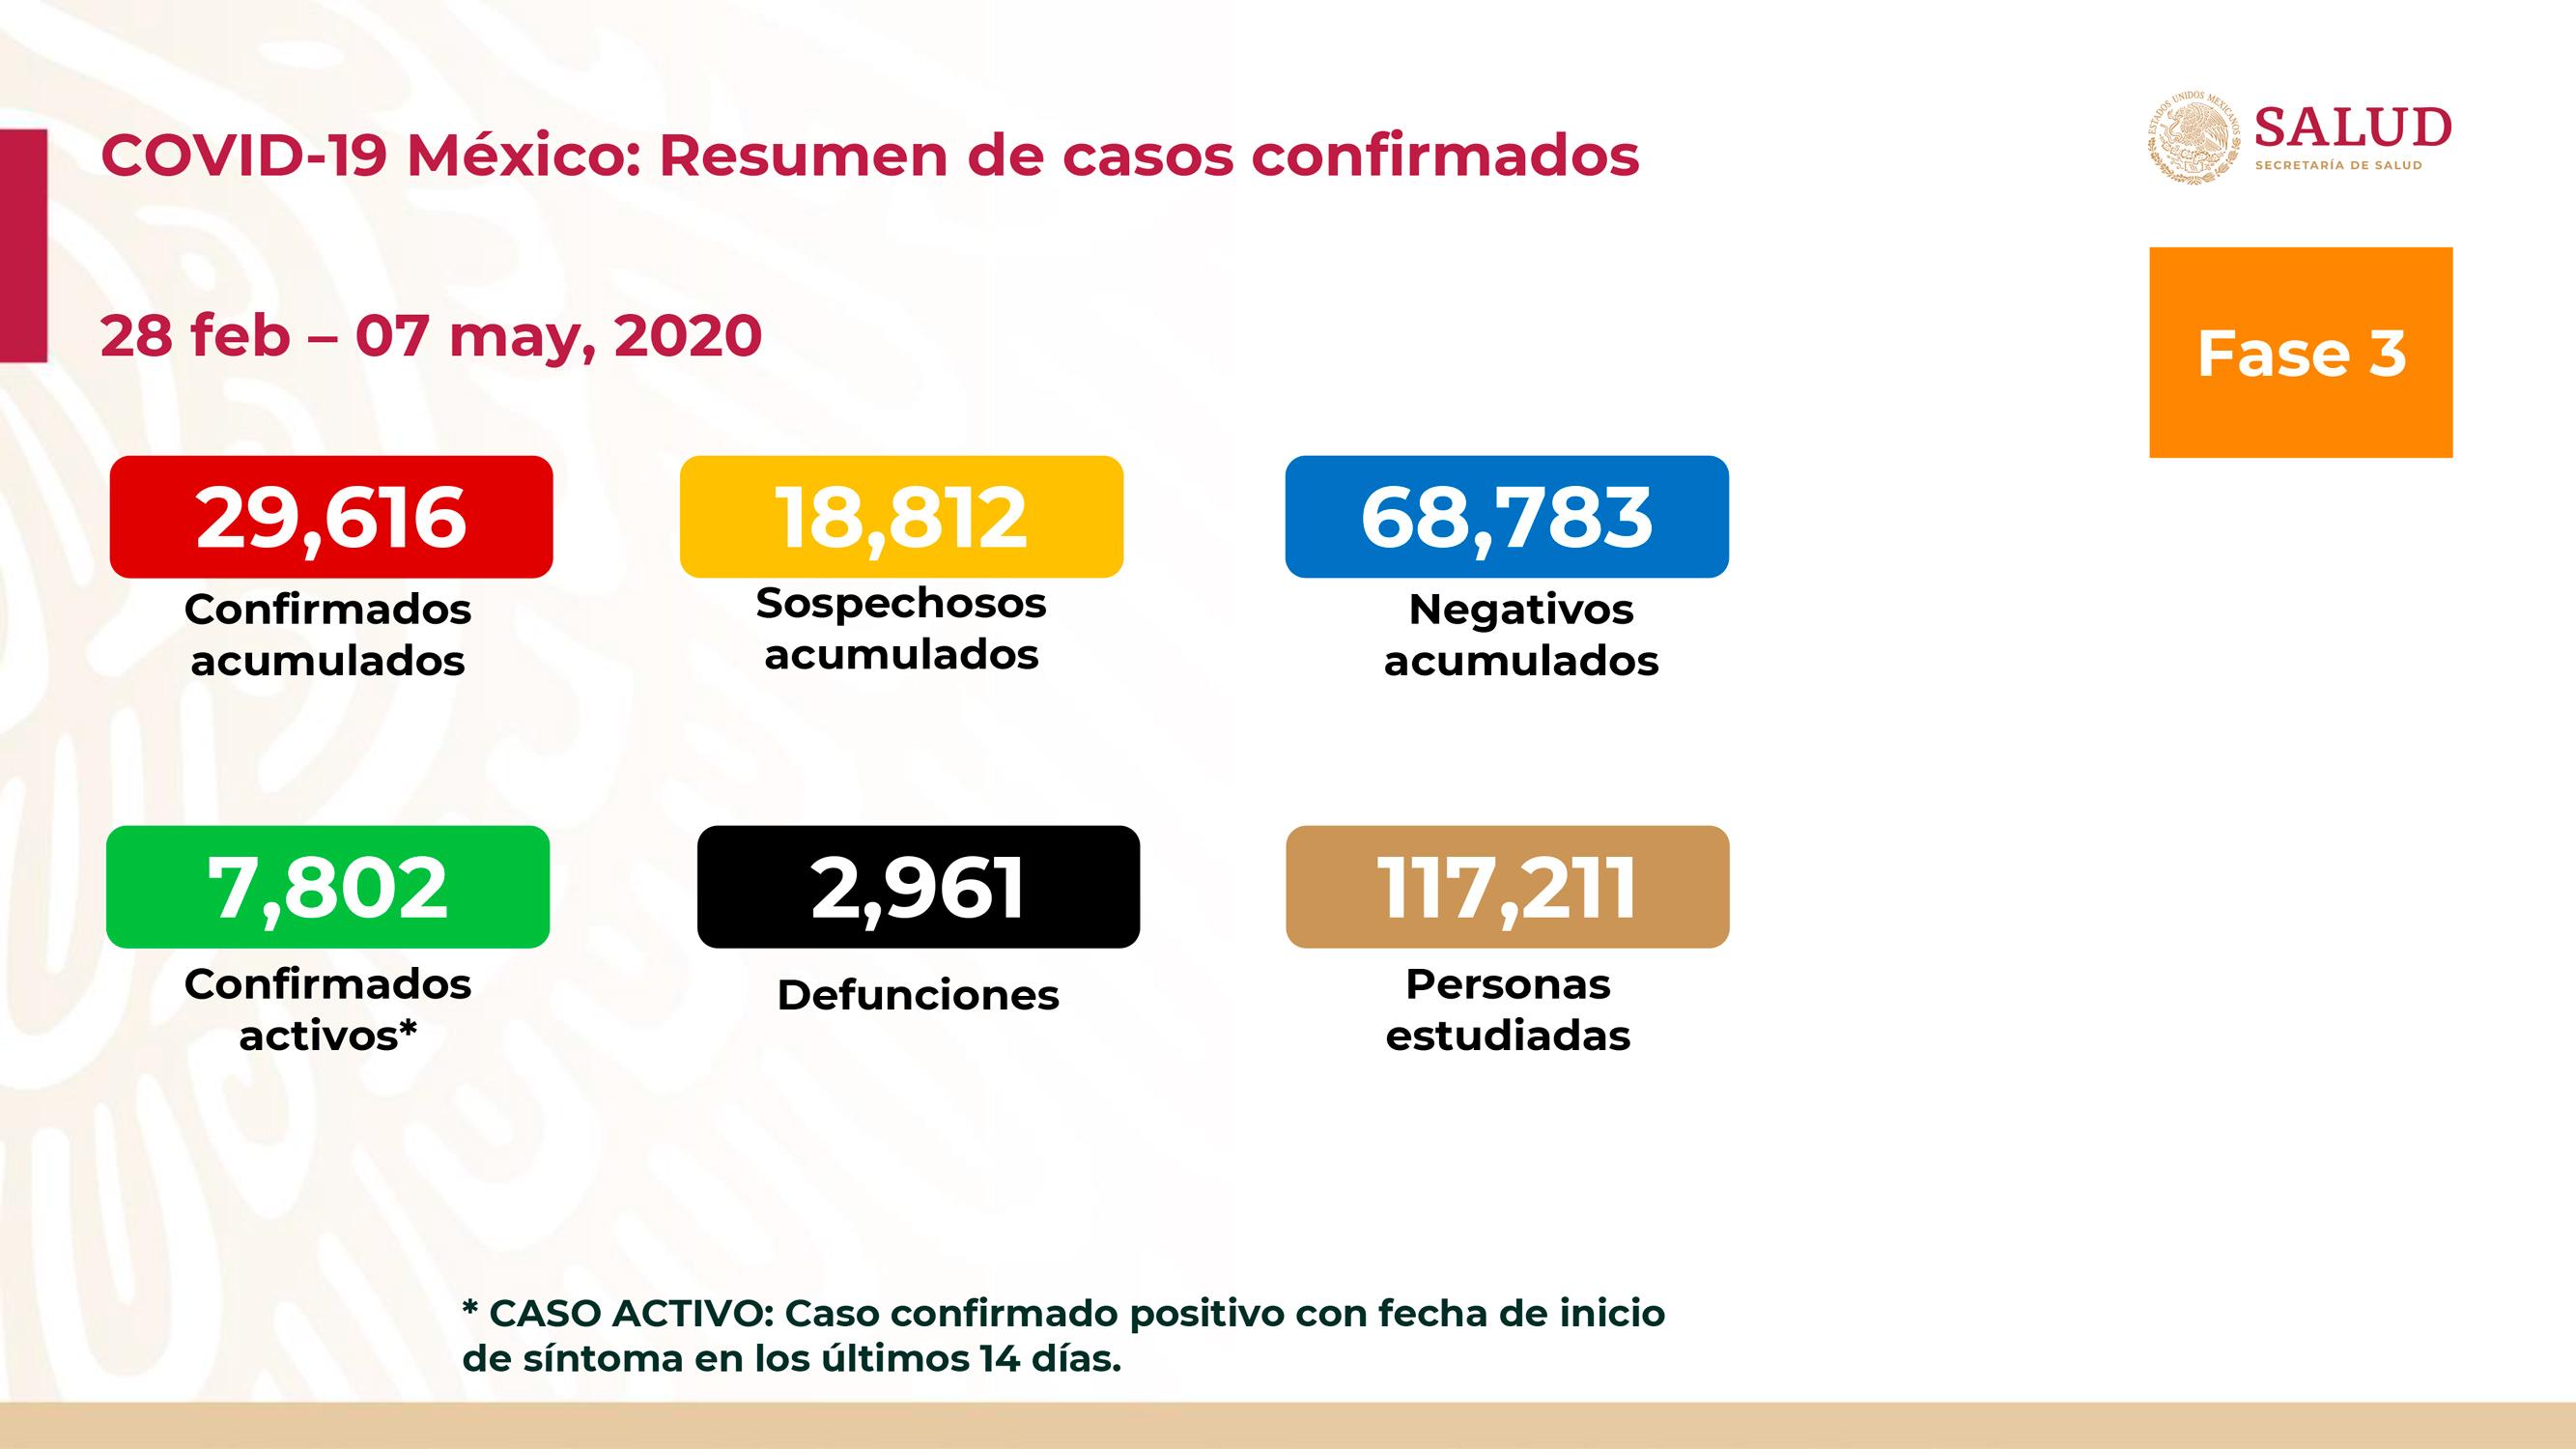 SUMAN 2 MIL 961 MUERTES POR COVID-19 EN MÉXICO